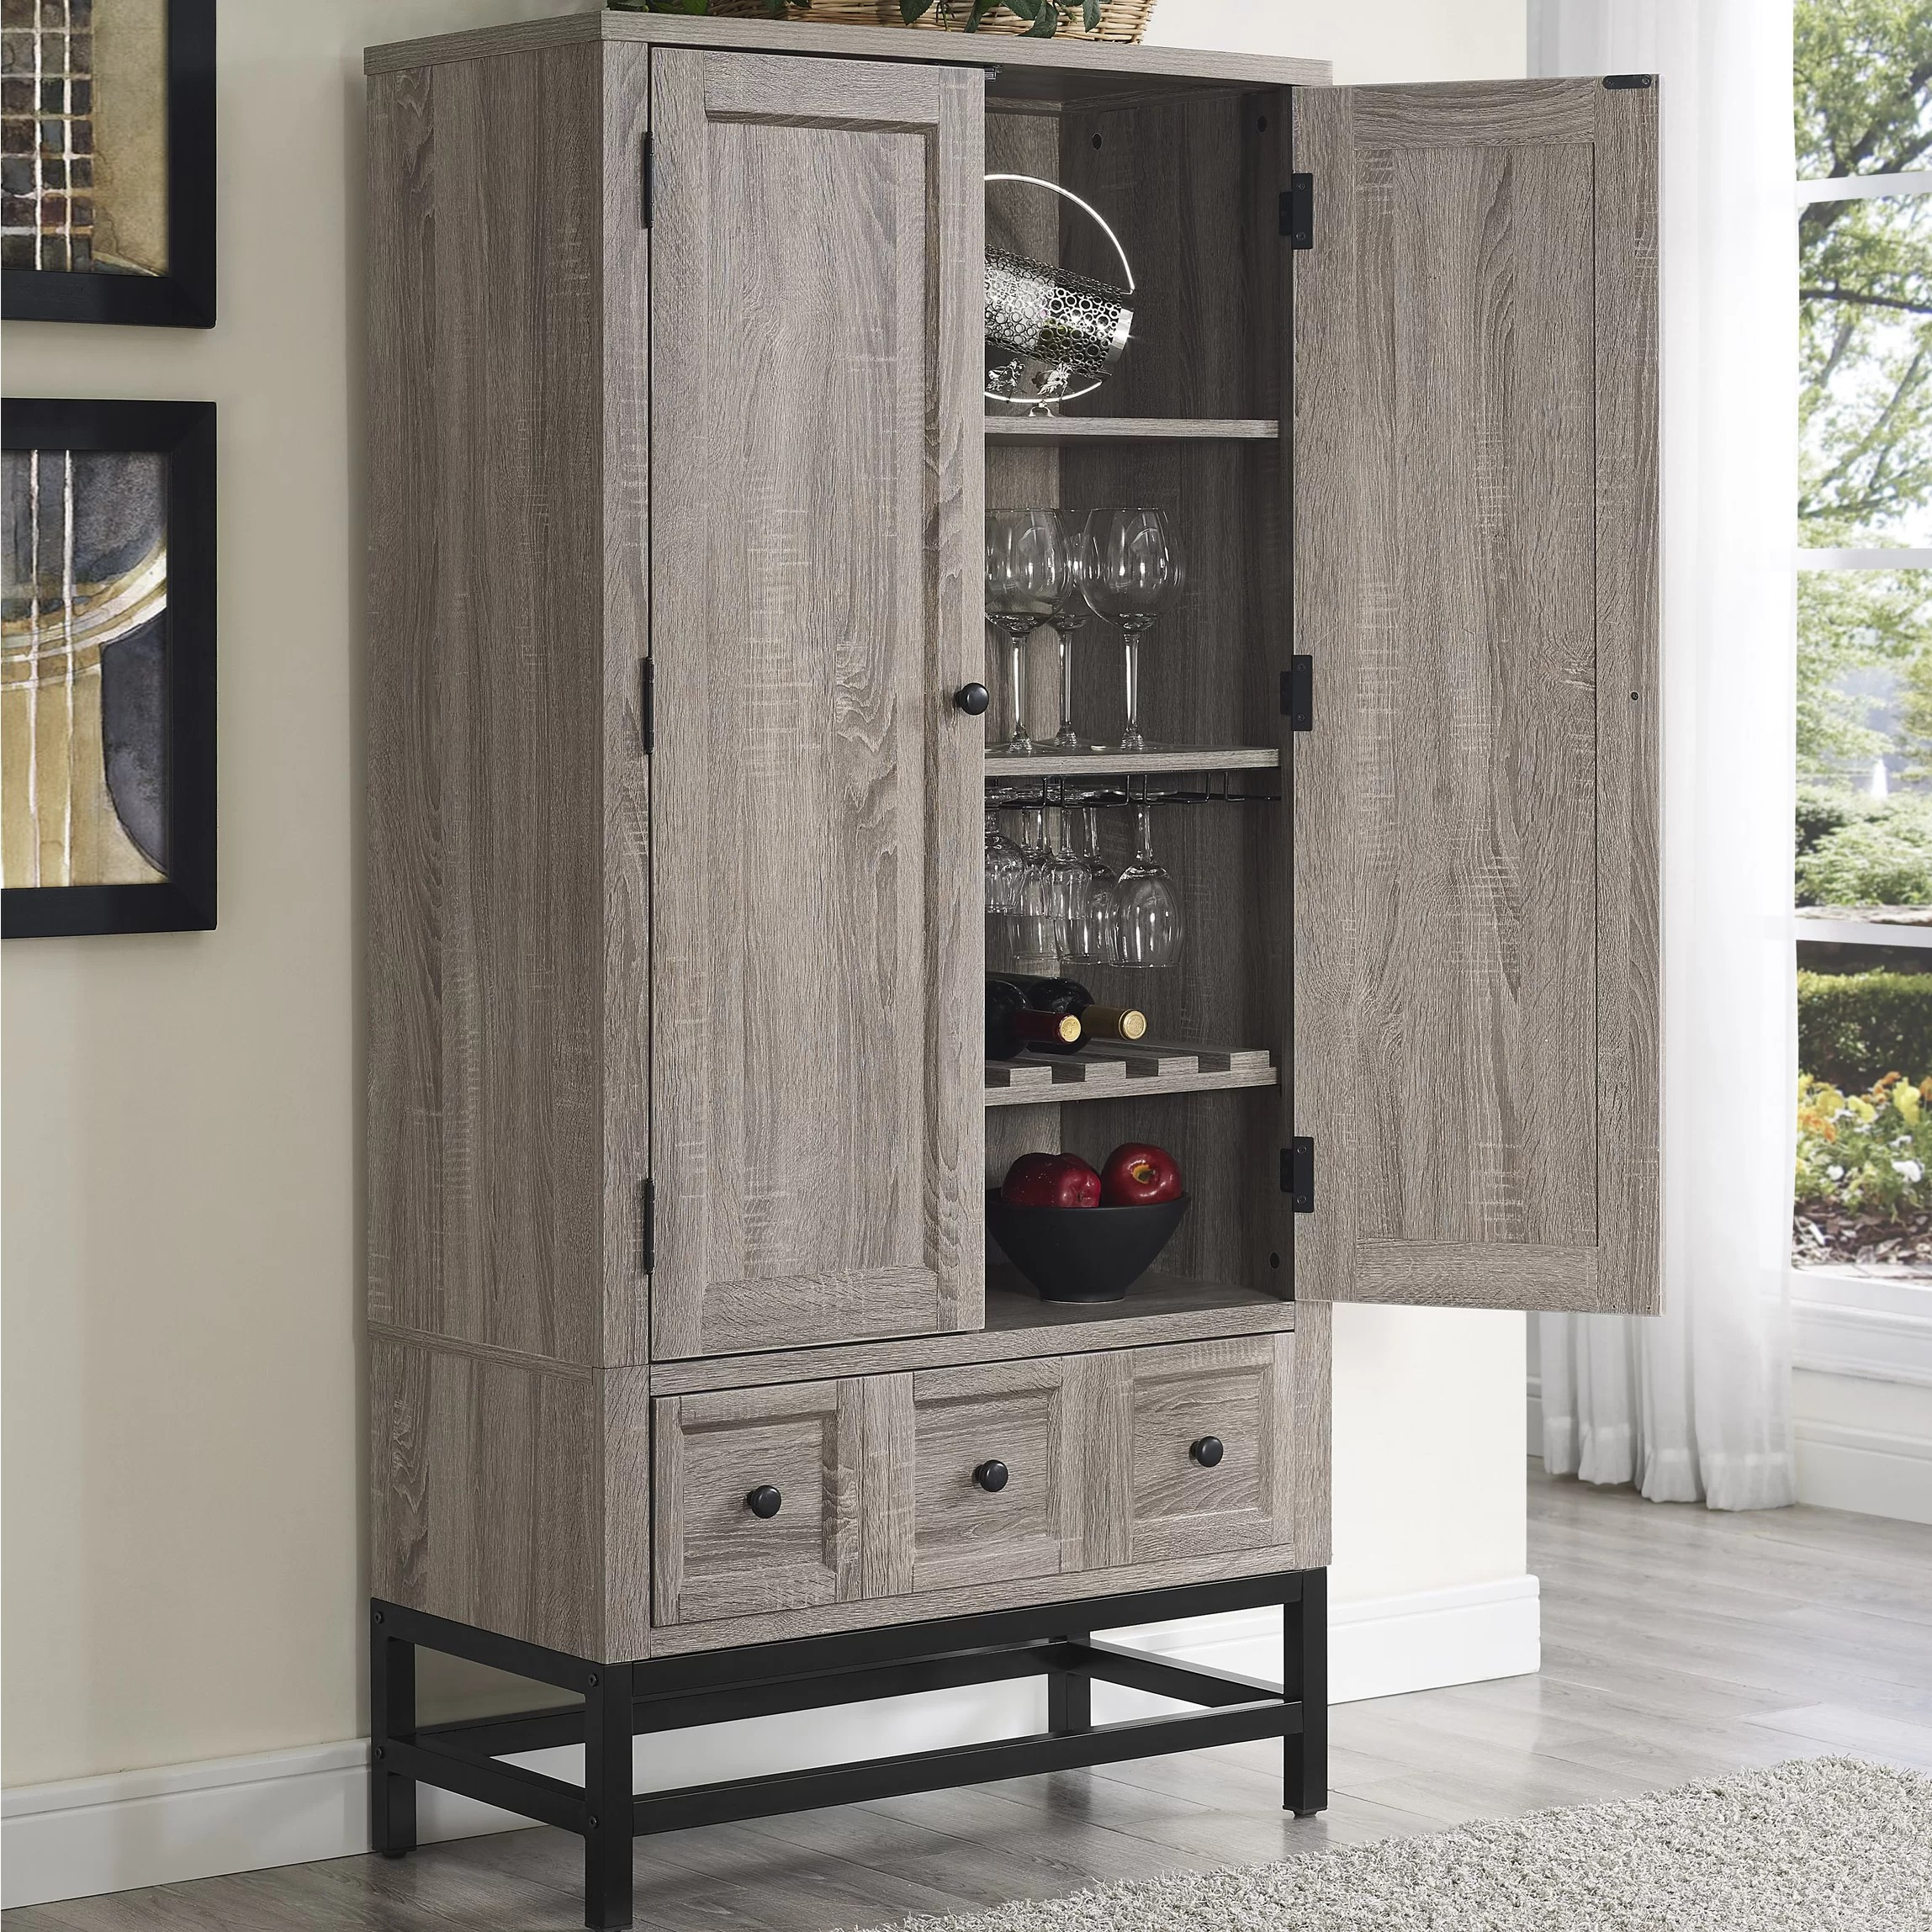 Laurel Foundry Modern Farmhouse Omar Beverage Cabinet  Reviews  Wayfairca